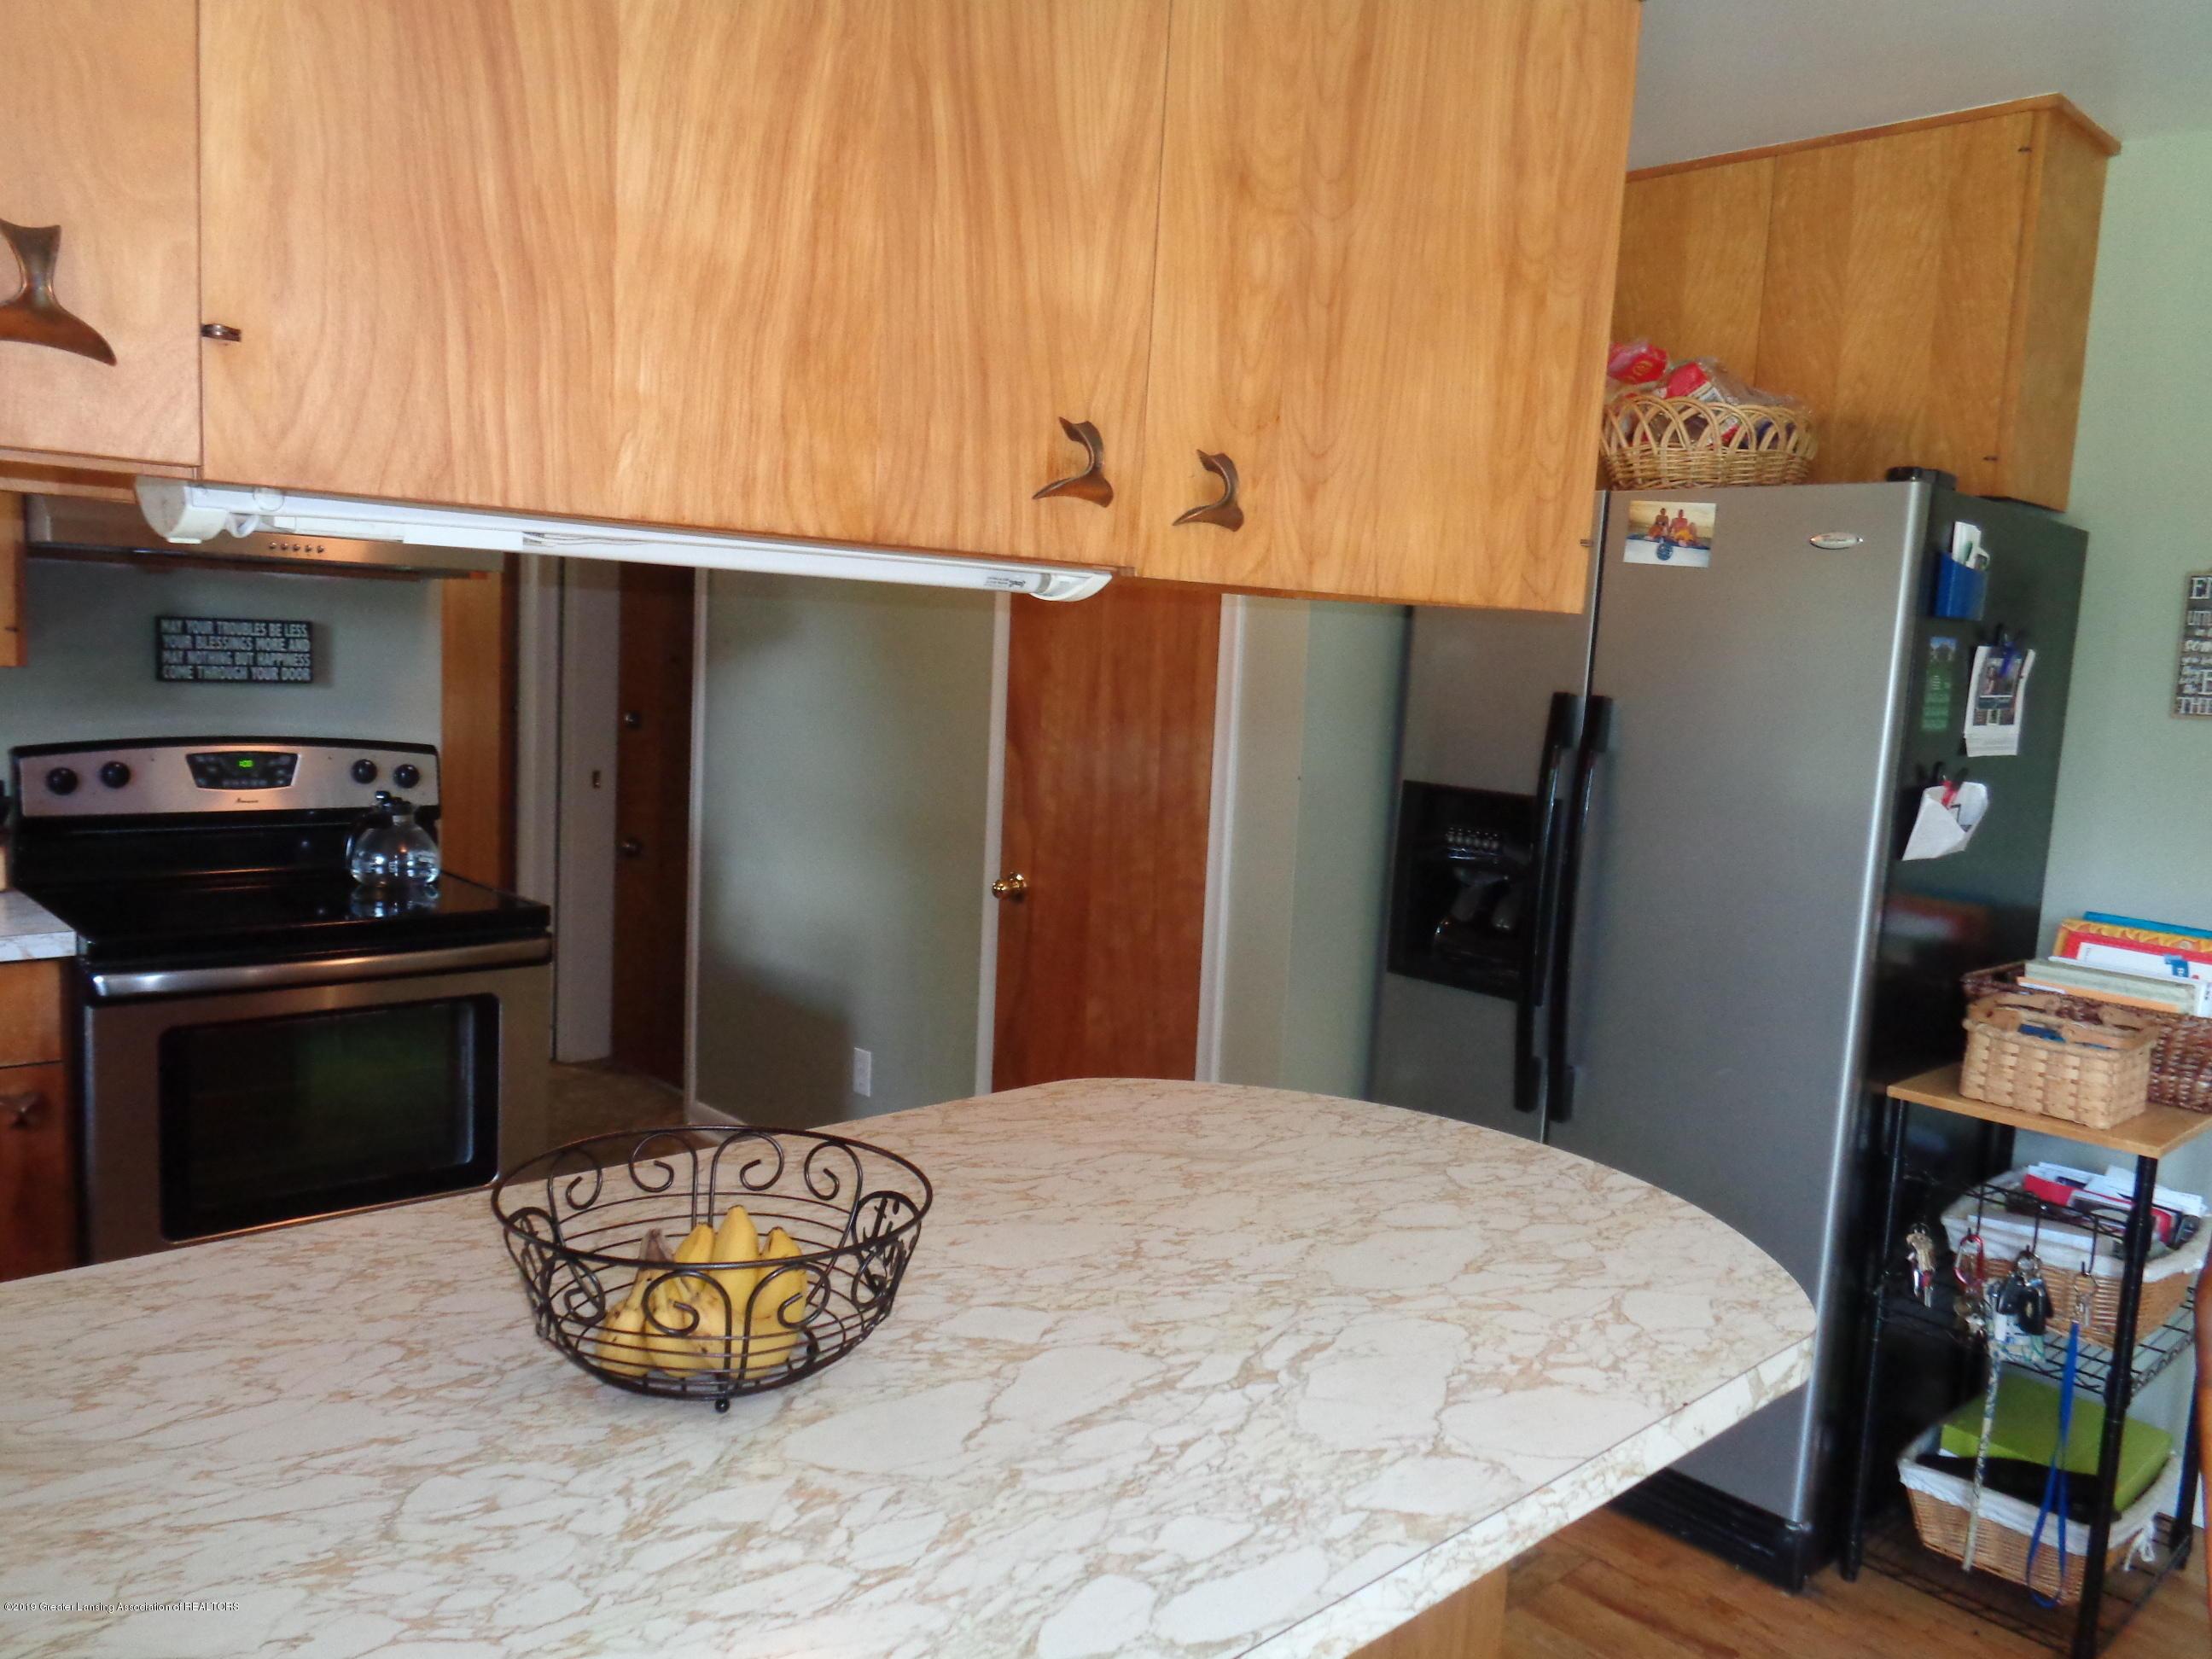 3525 W Kalamazoo St - kalamazoo kitchen 2 - 7